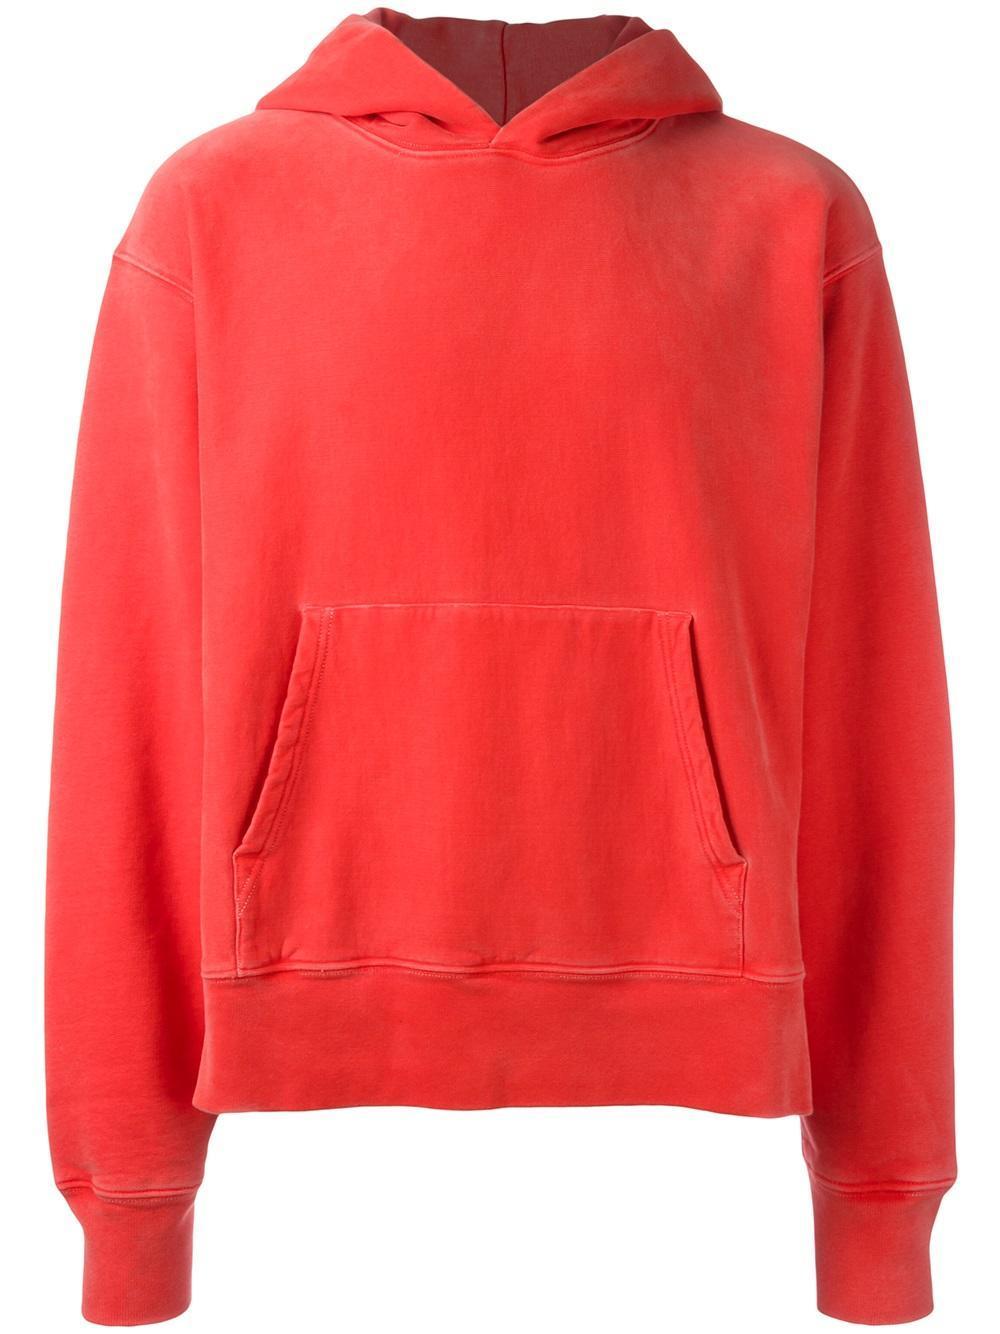 yeezy season 3 fleece hoodie in red for men lyst. Black Bedroom Furniture Sets. Home Design Ideas